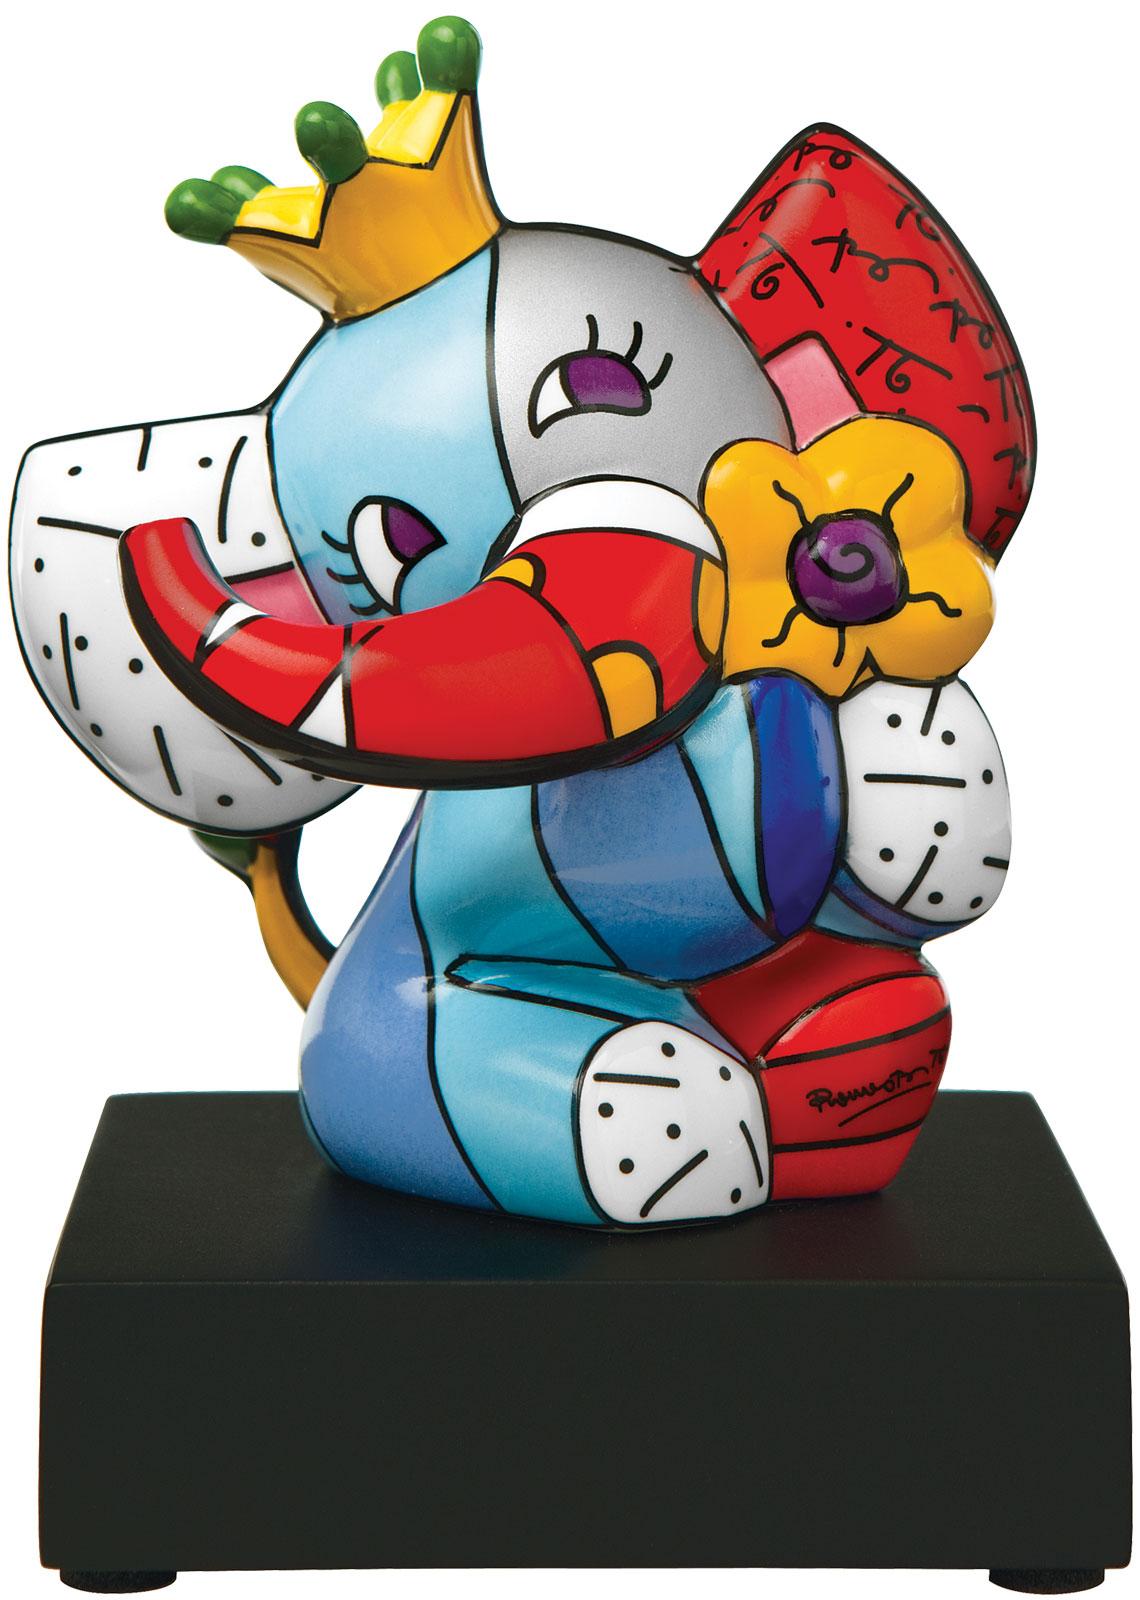 "Porzellanskulptur ""Spring Elephant"", kleine Version"